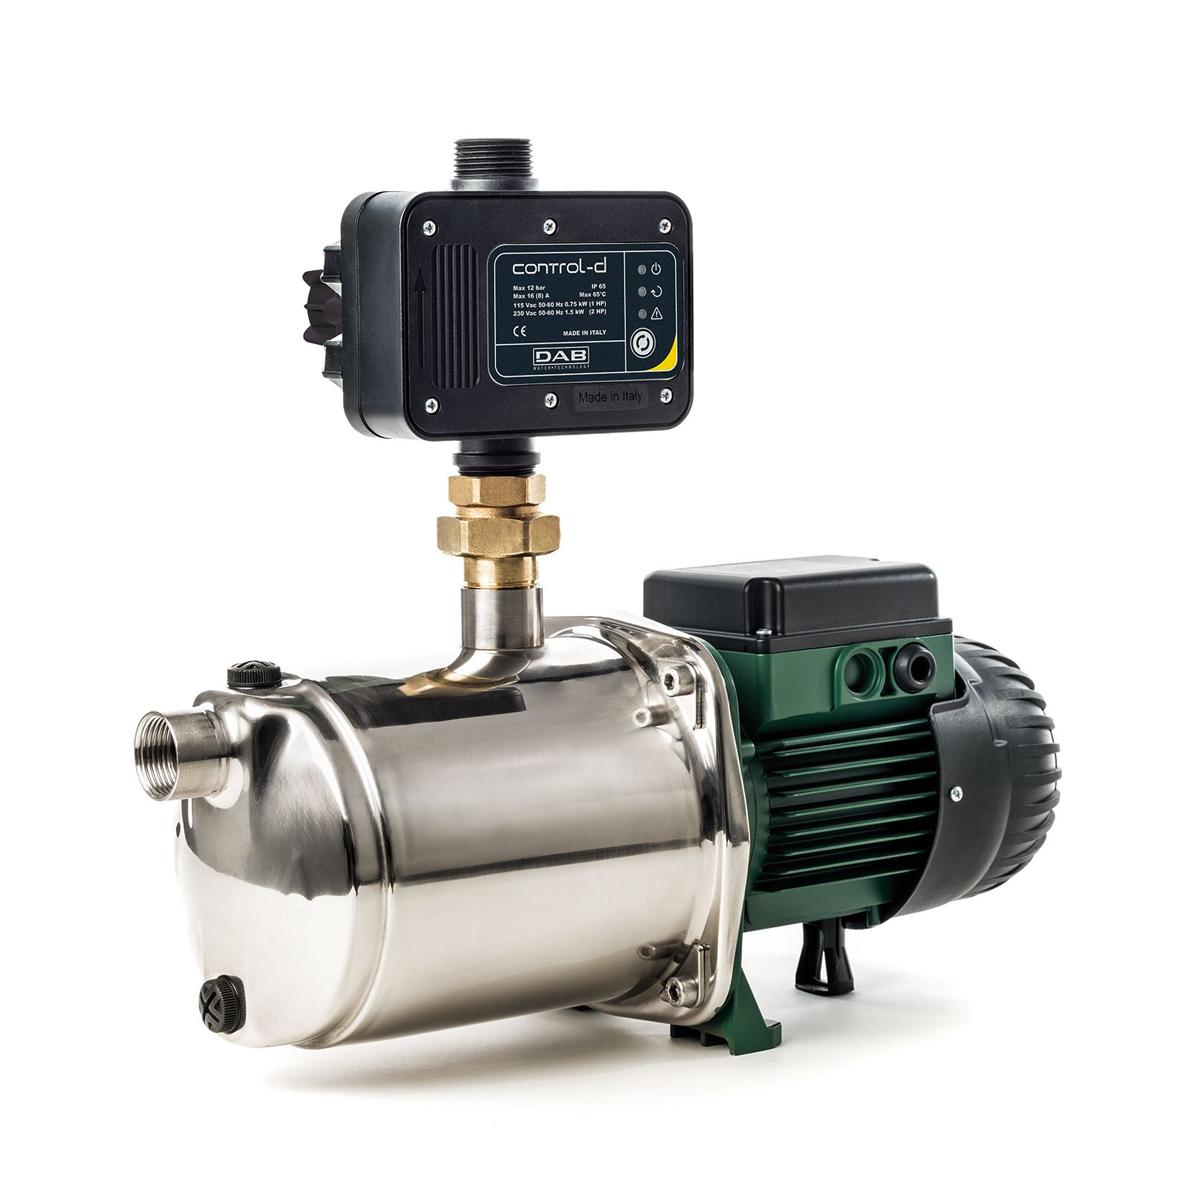 DAB EuroInox 30/30 M + Control-D